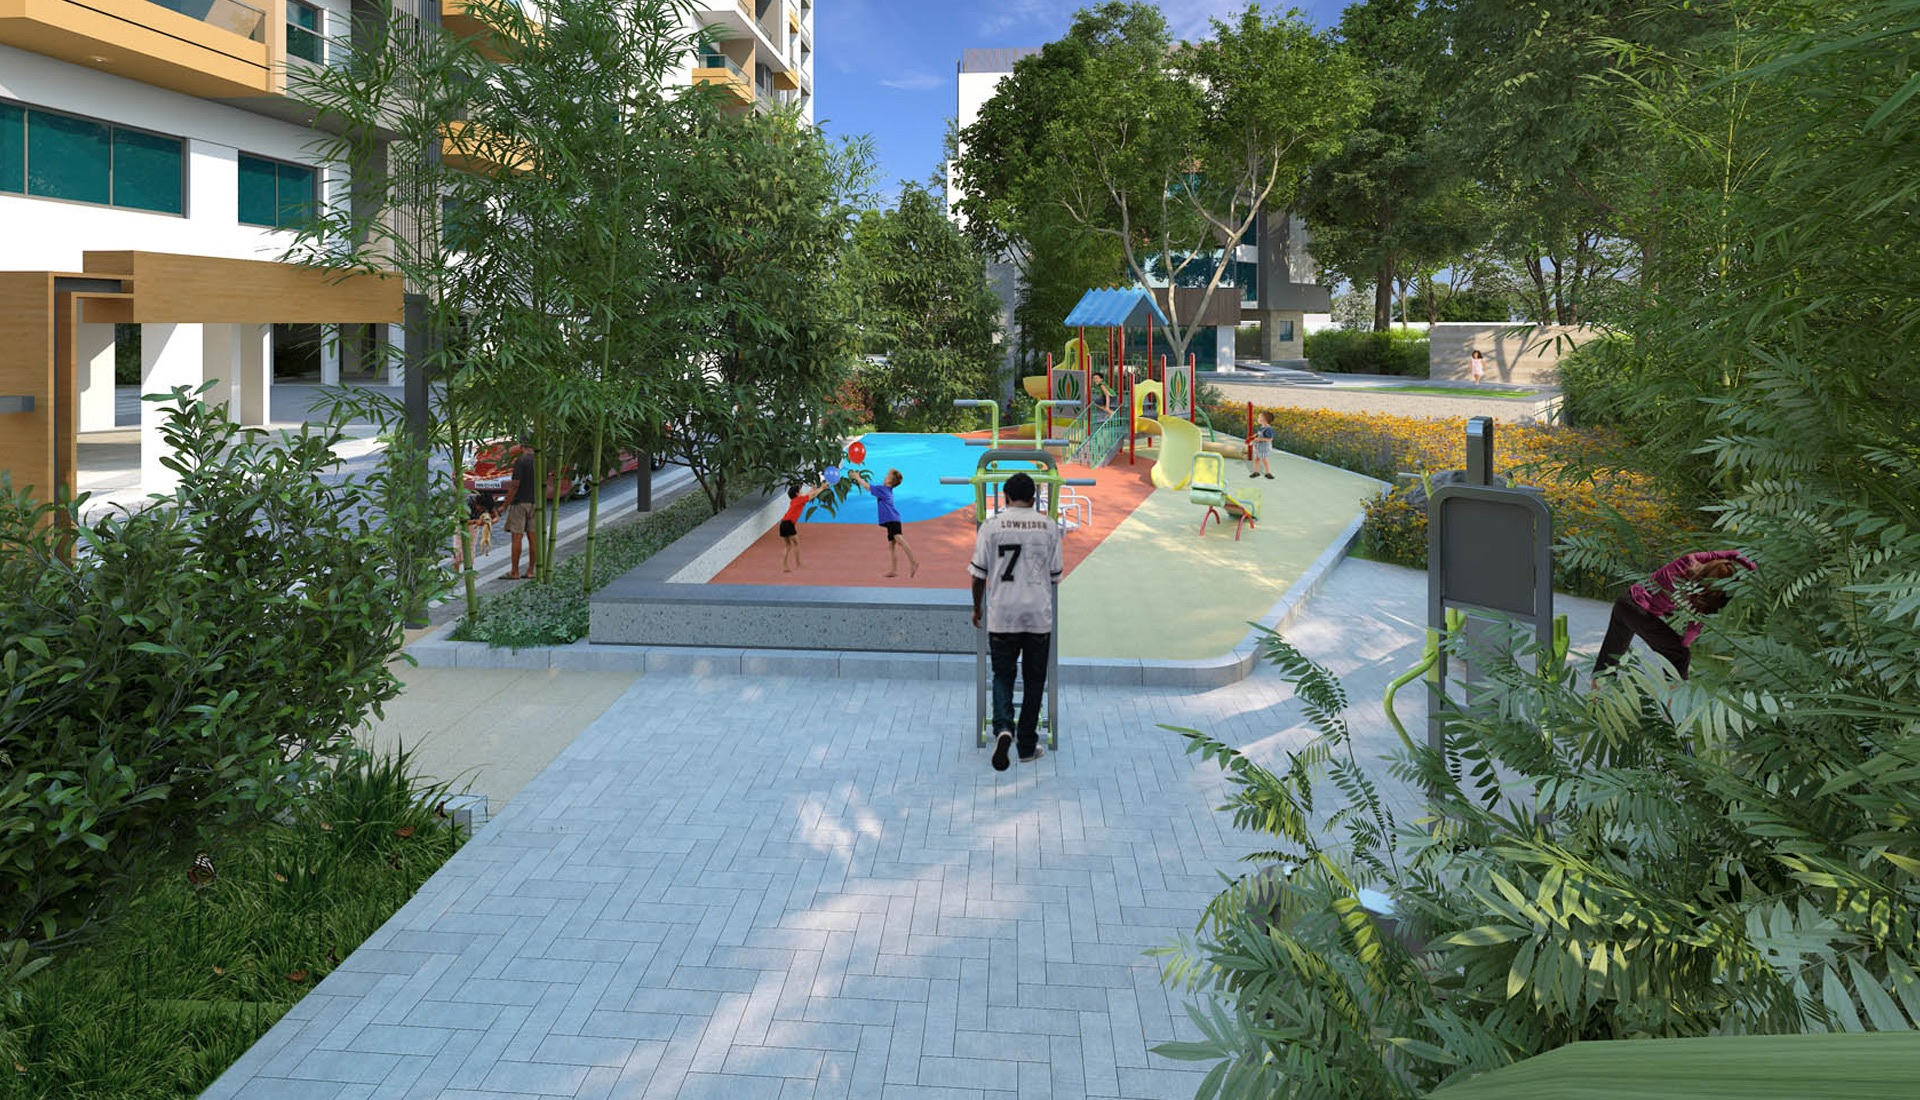 amenities-features-Picture-bricks-skywoods-2592770